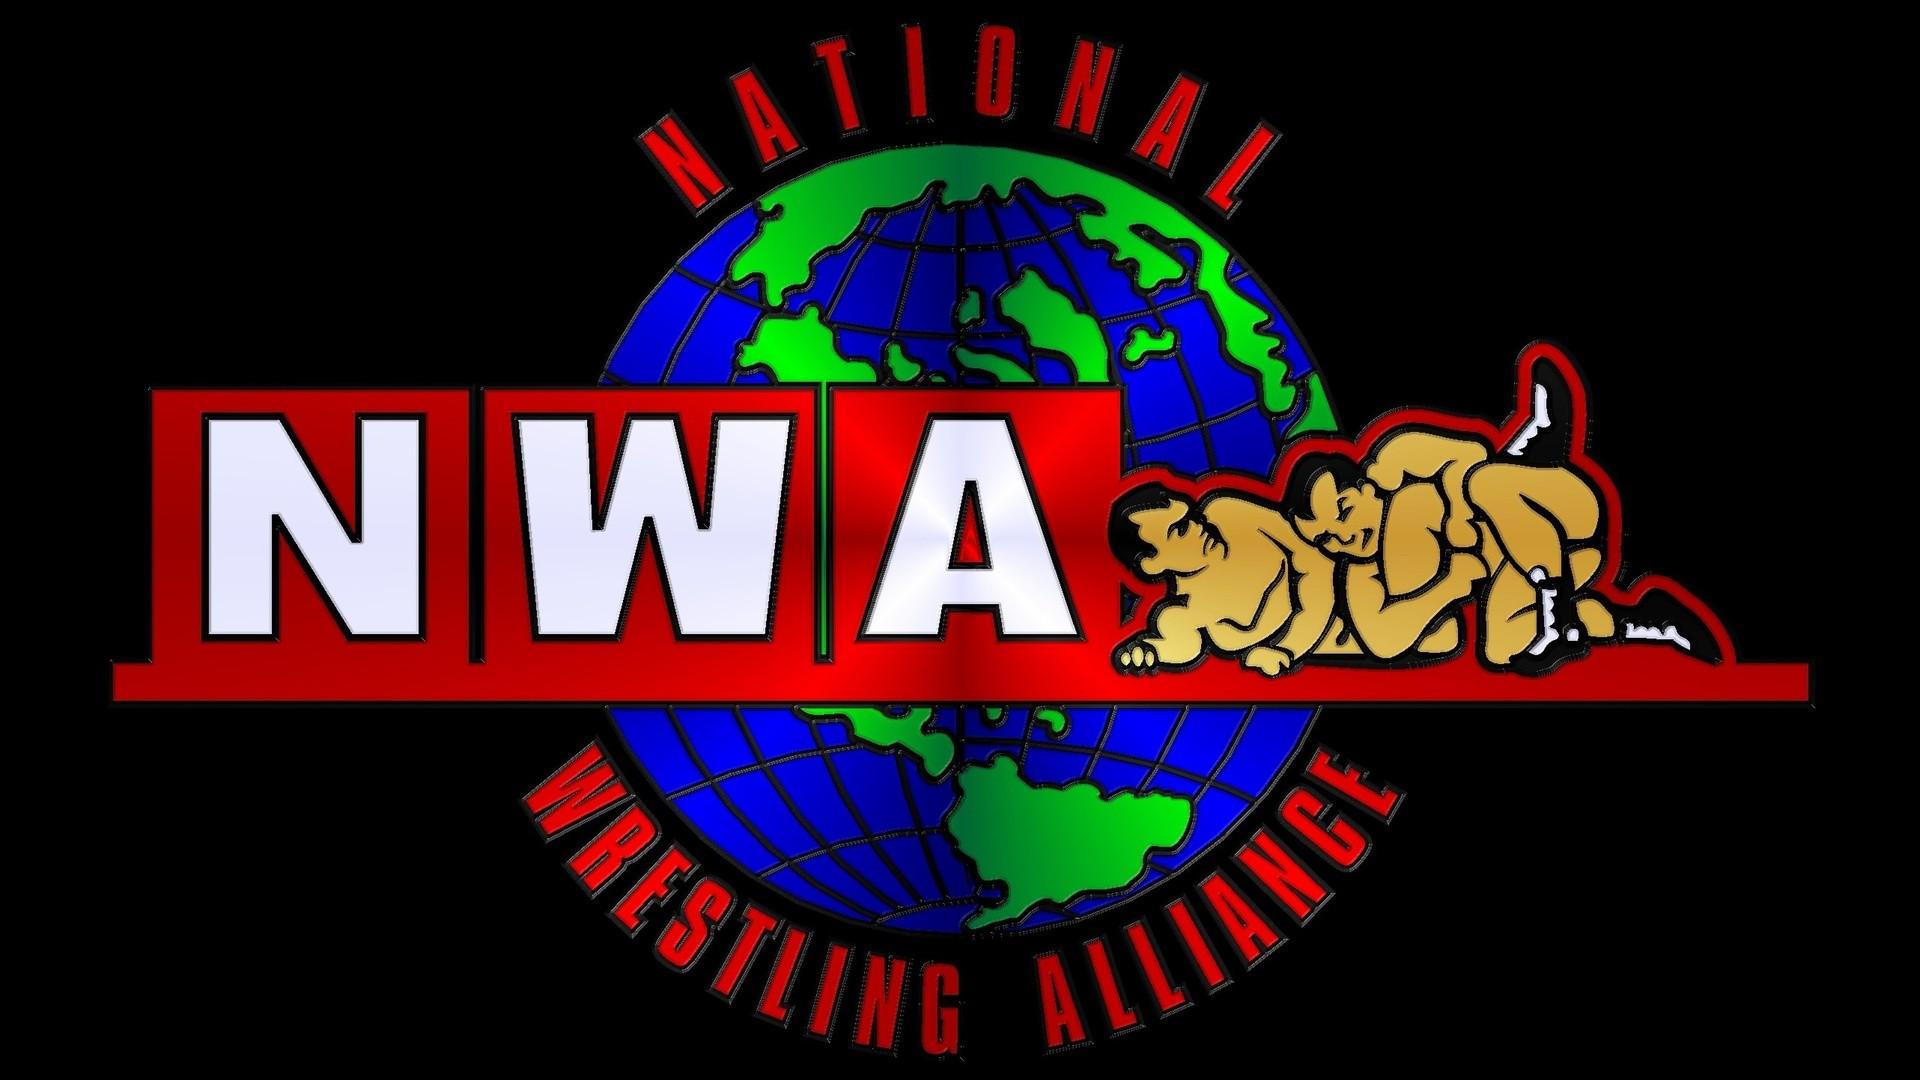 Res: 1920x1080, Wrestling, Wrestling Logo, Nwa Logo, Nwa, National Wrestling Alliance